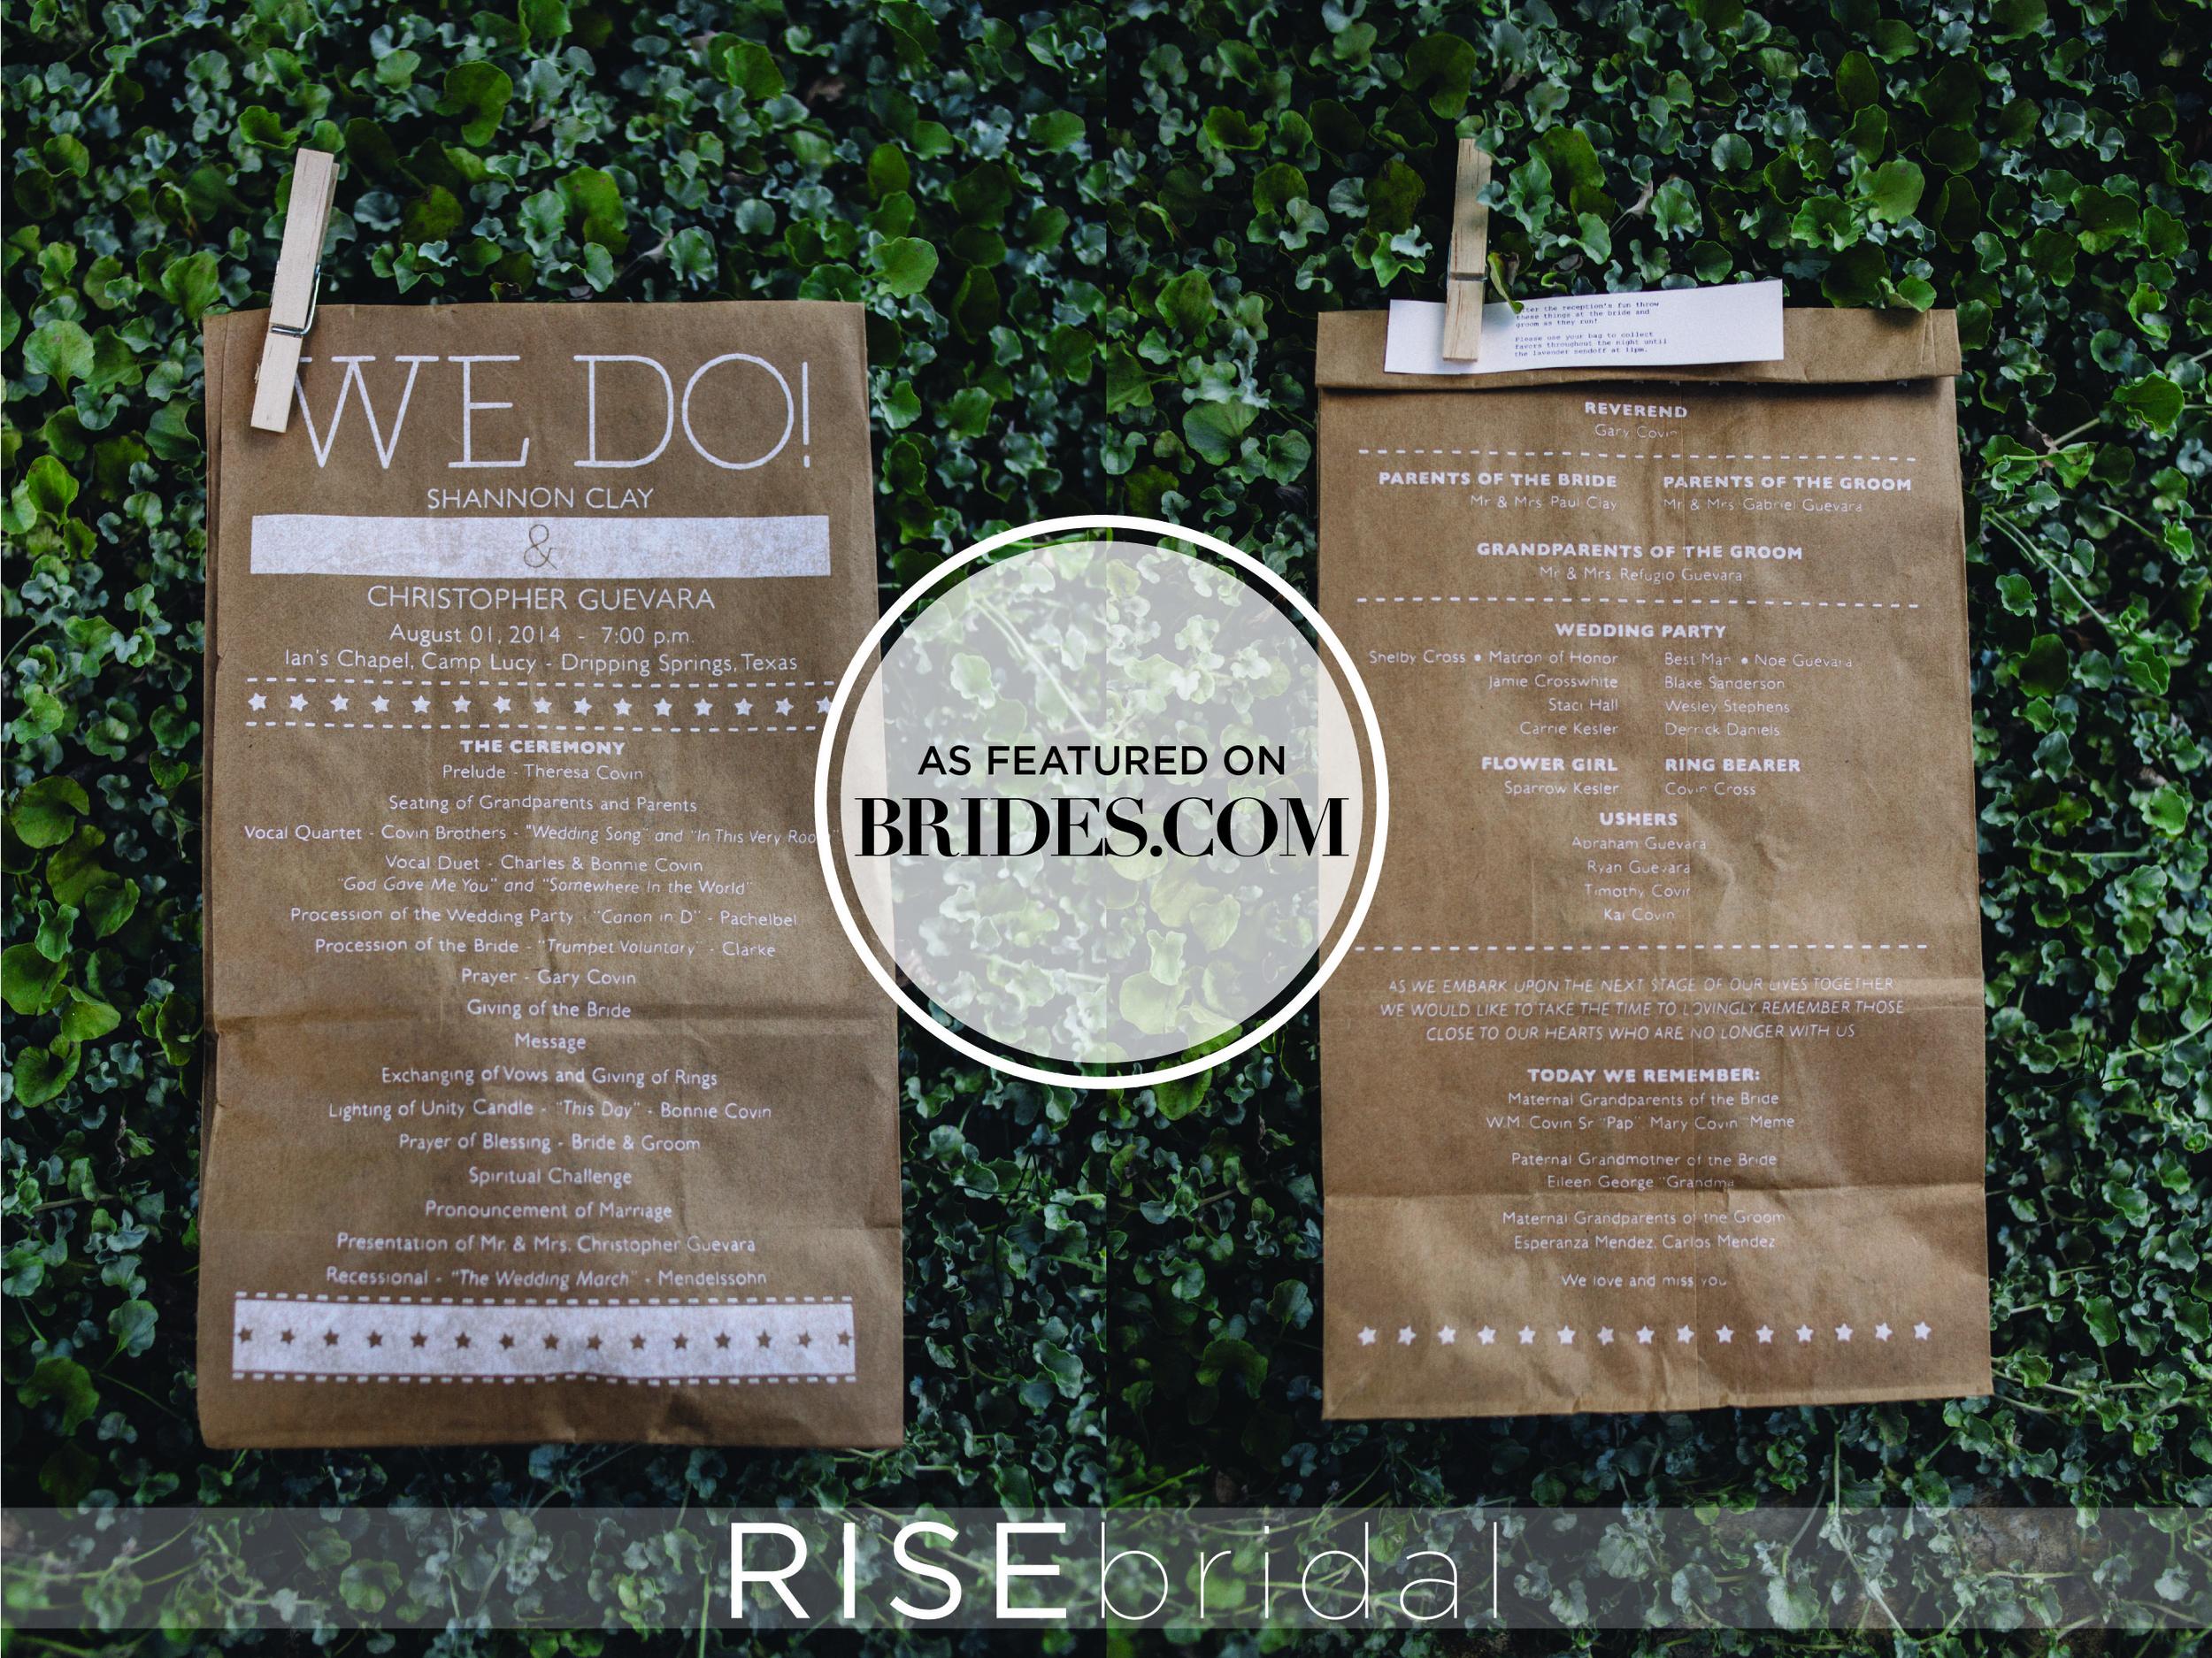 RISE bridal silk screen printing Joel Loera hero image BRIDES version.jpg